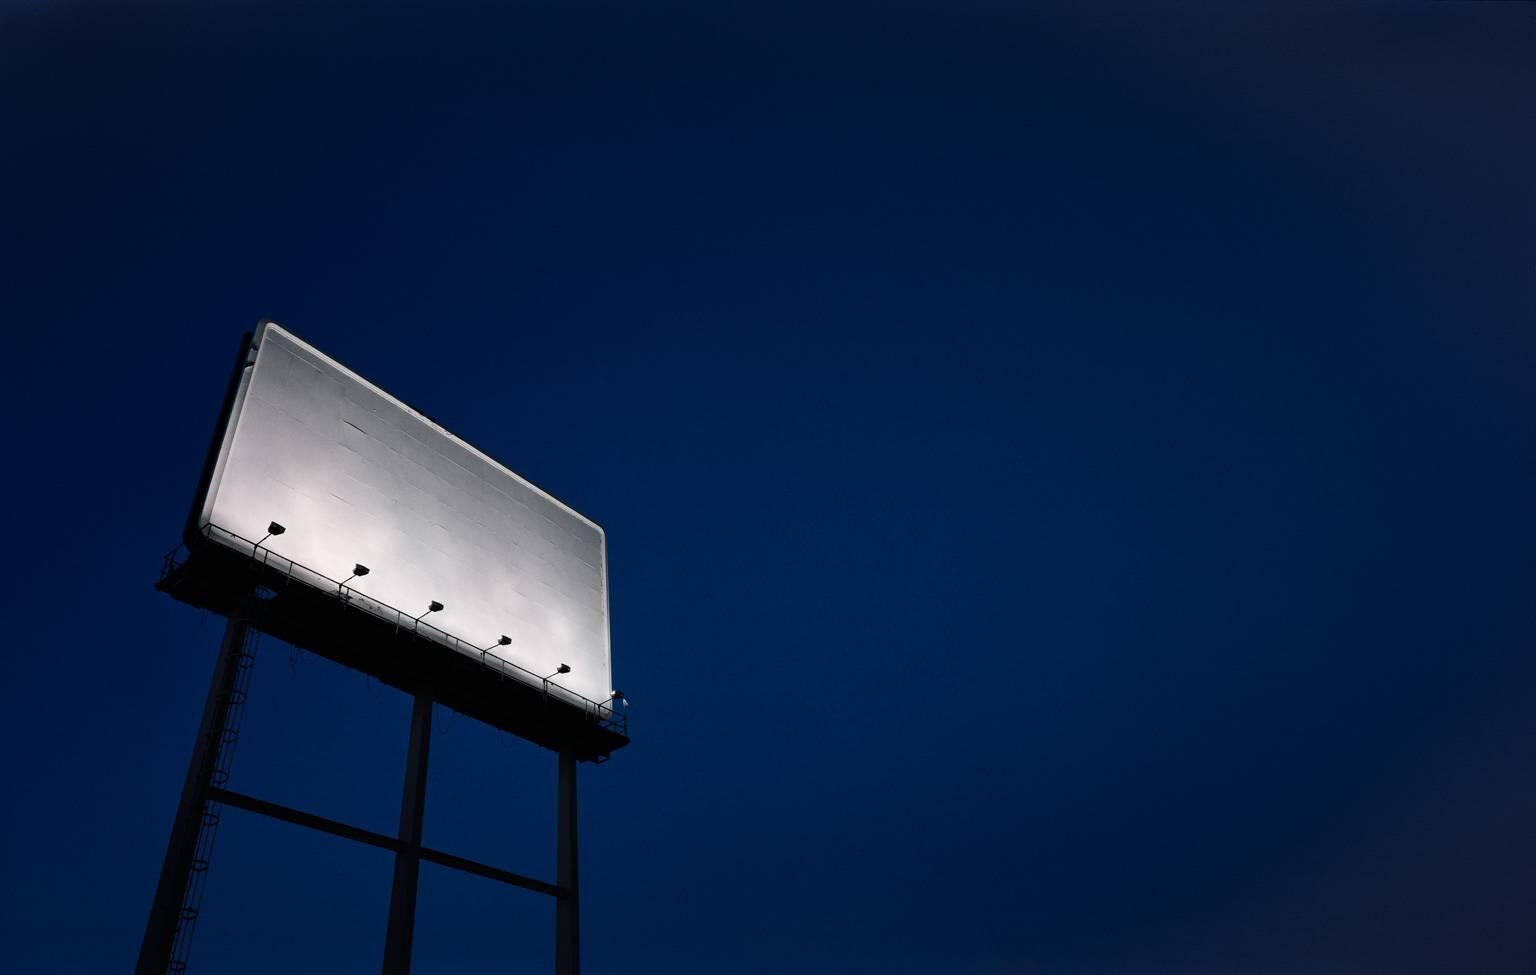 Billboard - large scale monochromatic photograph of iconic Americana billboard